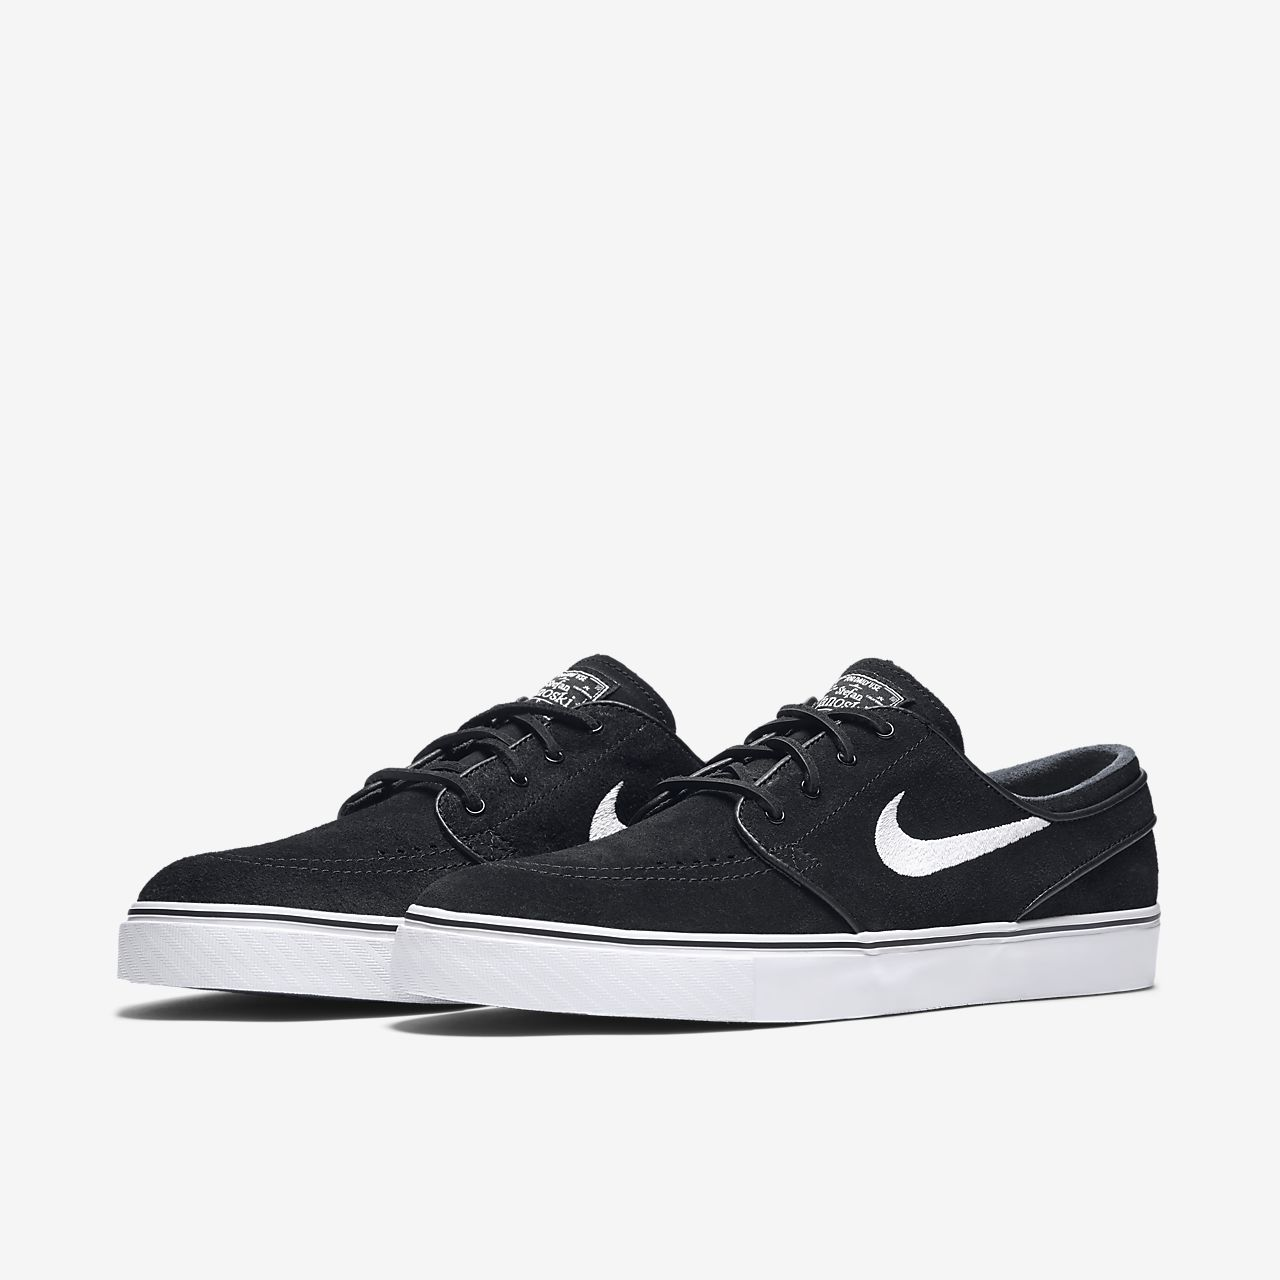 468d2d5db4 Nike Paul Rodriguez 9 VR,Zapatillas de Skateboarding para Hombre,Negro  Blanco Black White Gum Light Brown,43 EU amazon shoes el negro Cordones